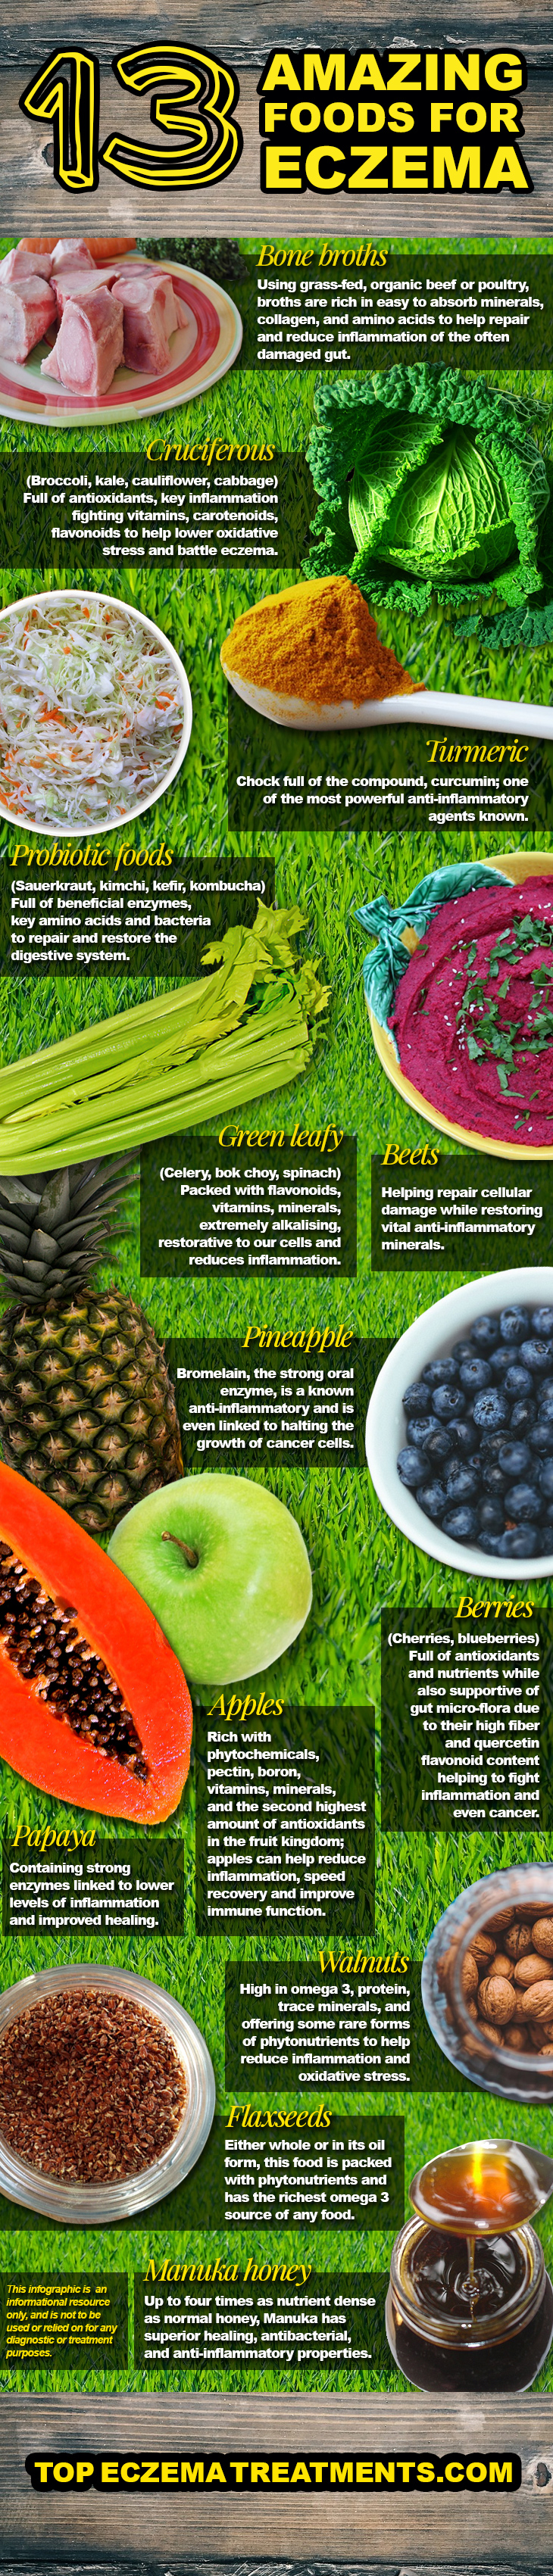 13 Amazing Foods For Eczema